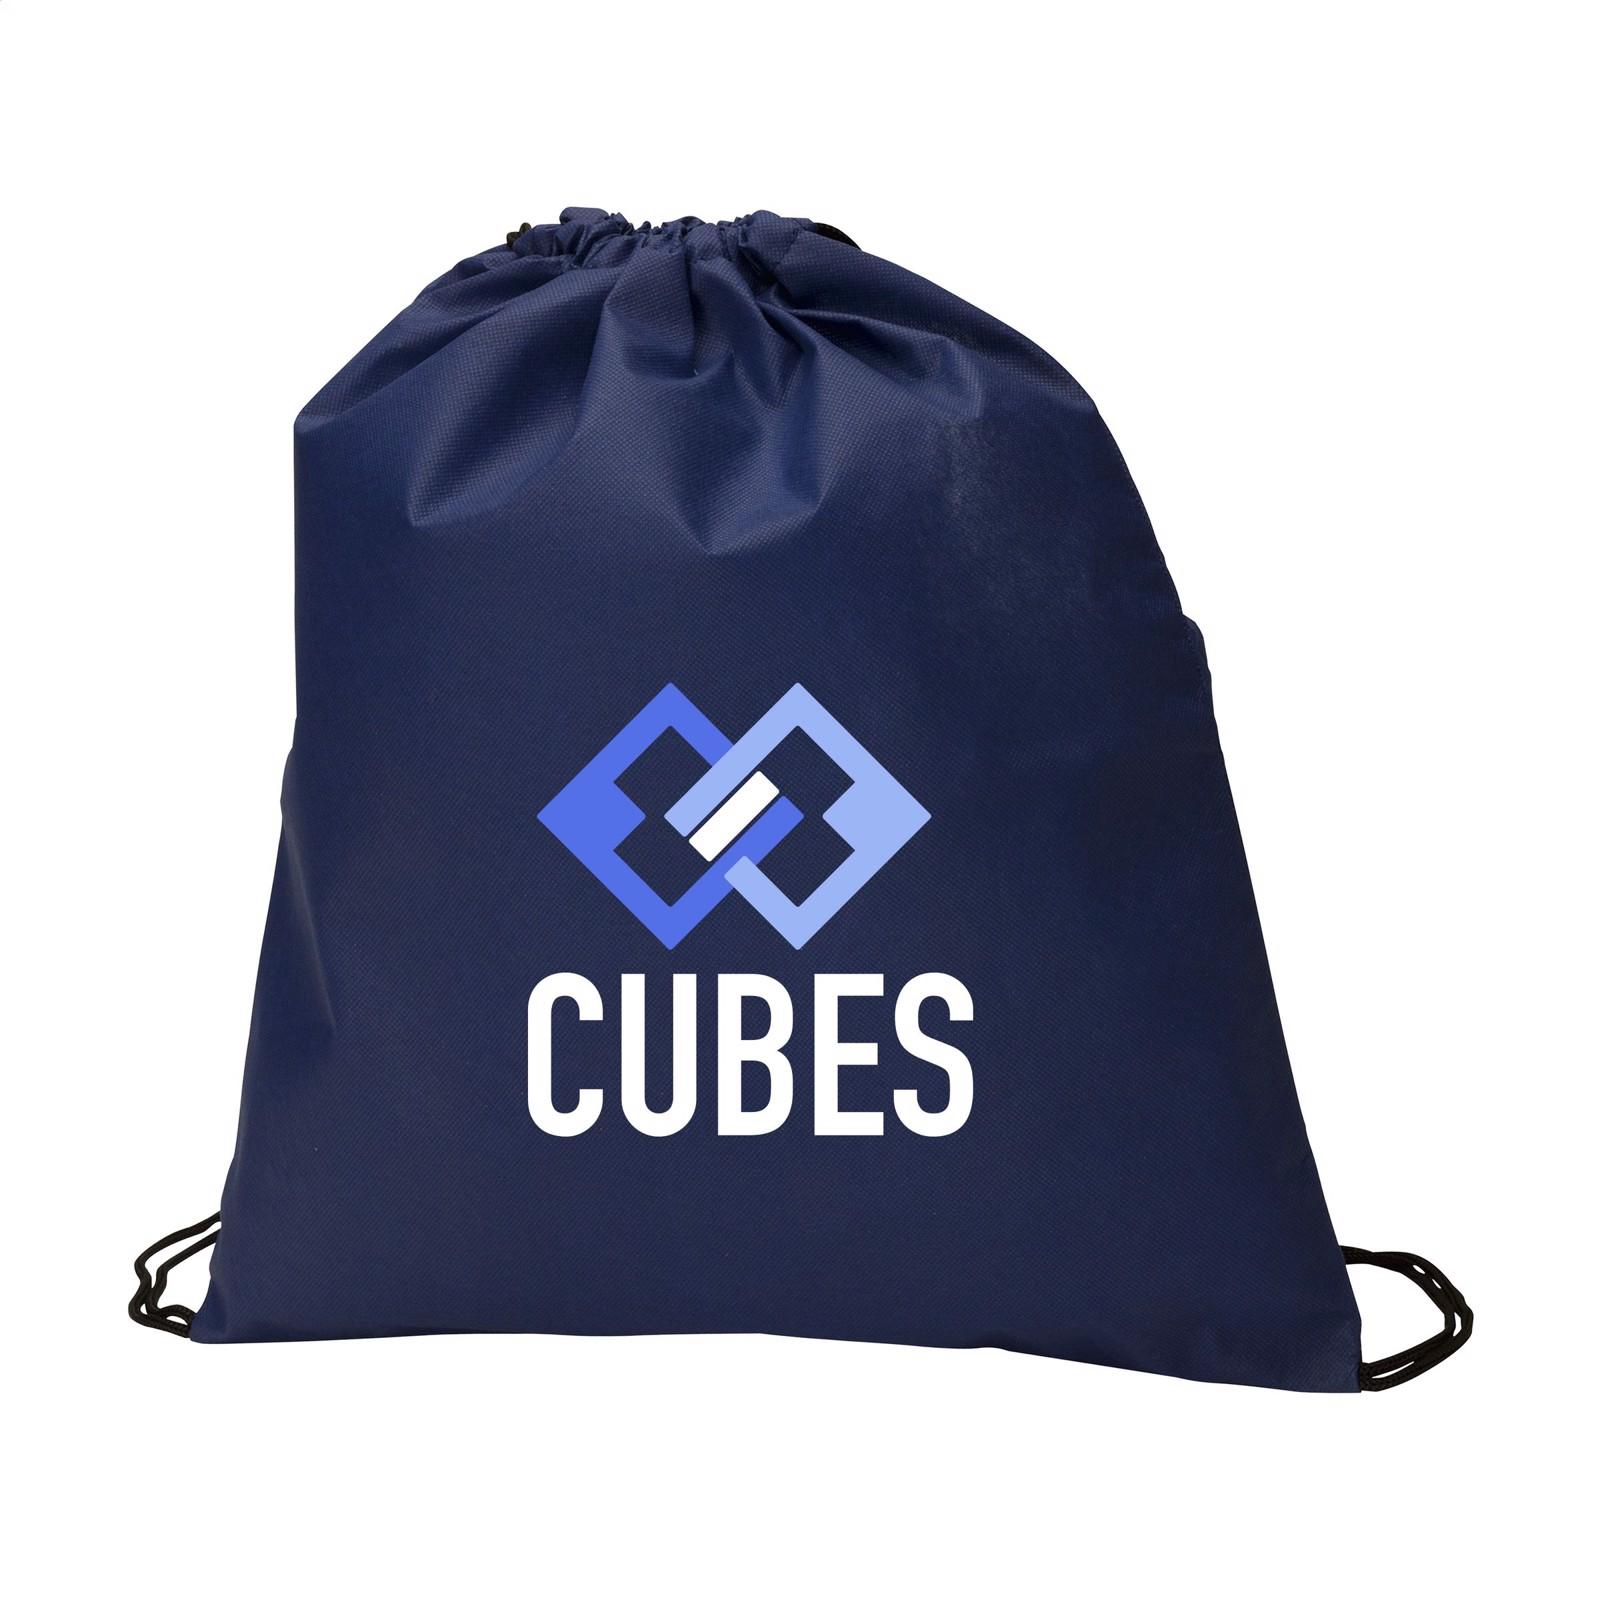 Non-Woven PromoBag backpack - Dark Blue